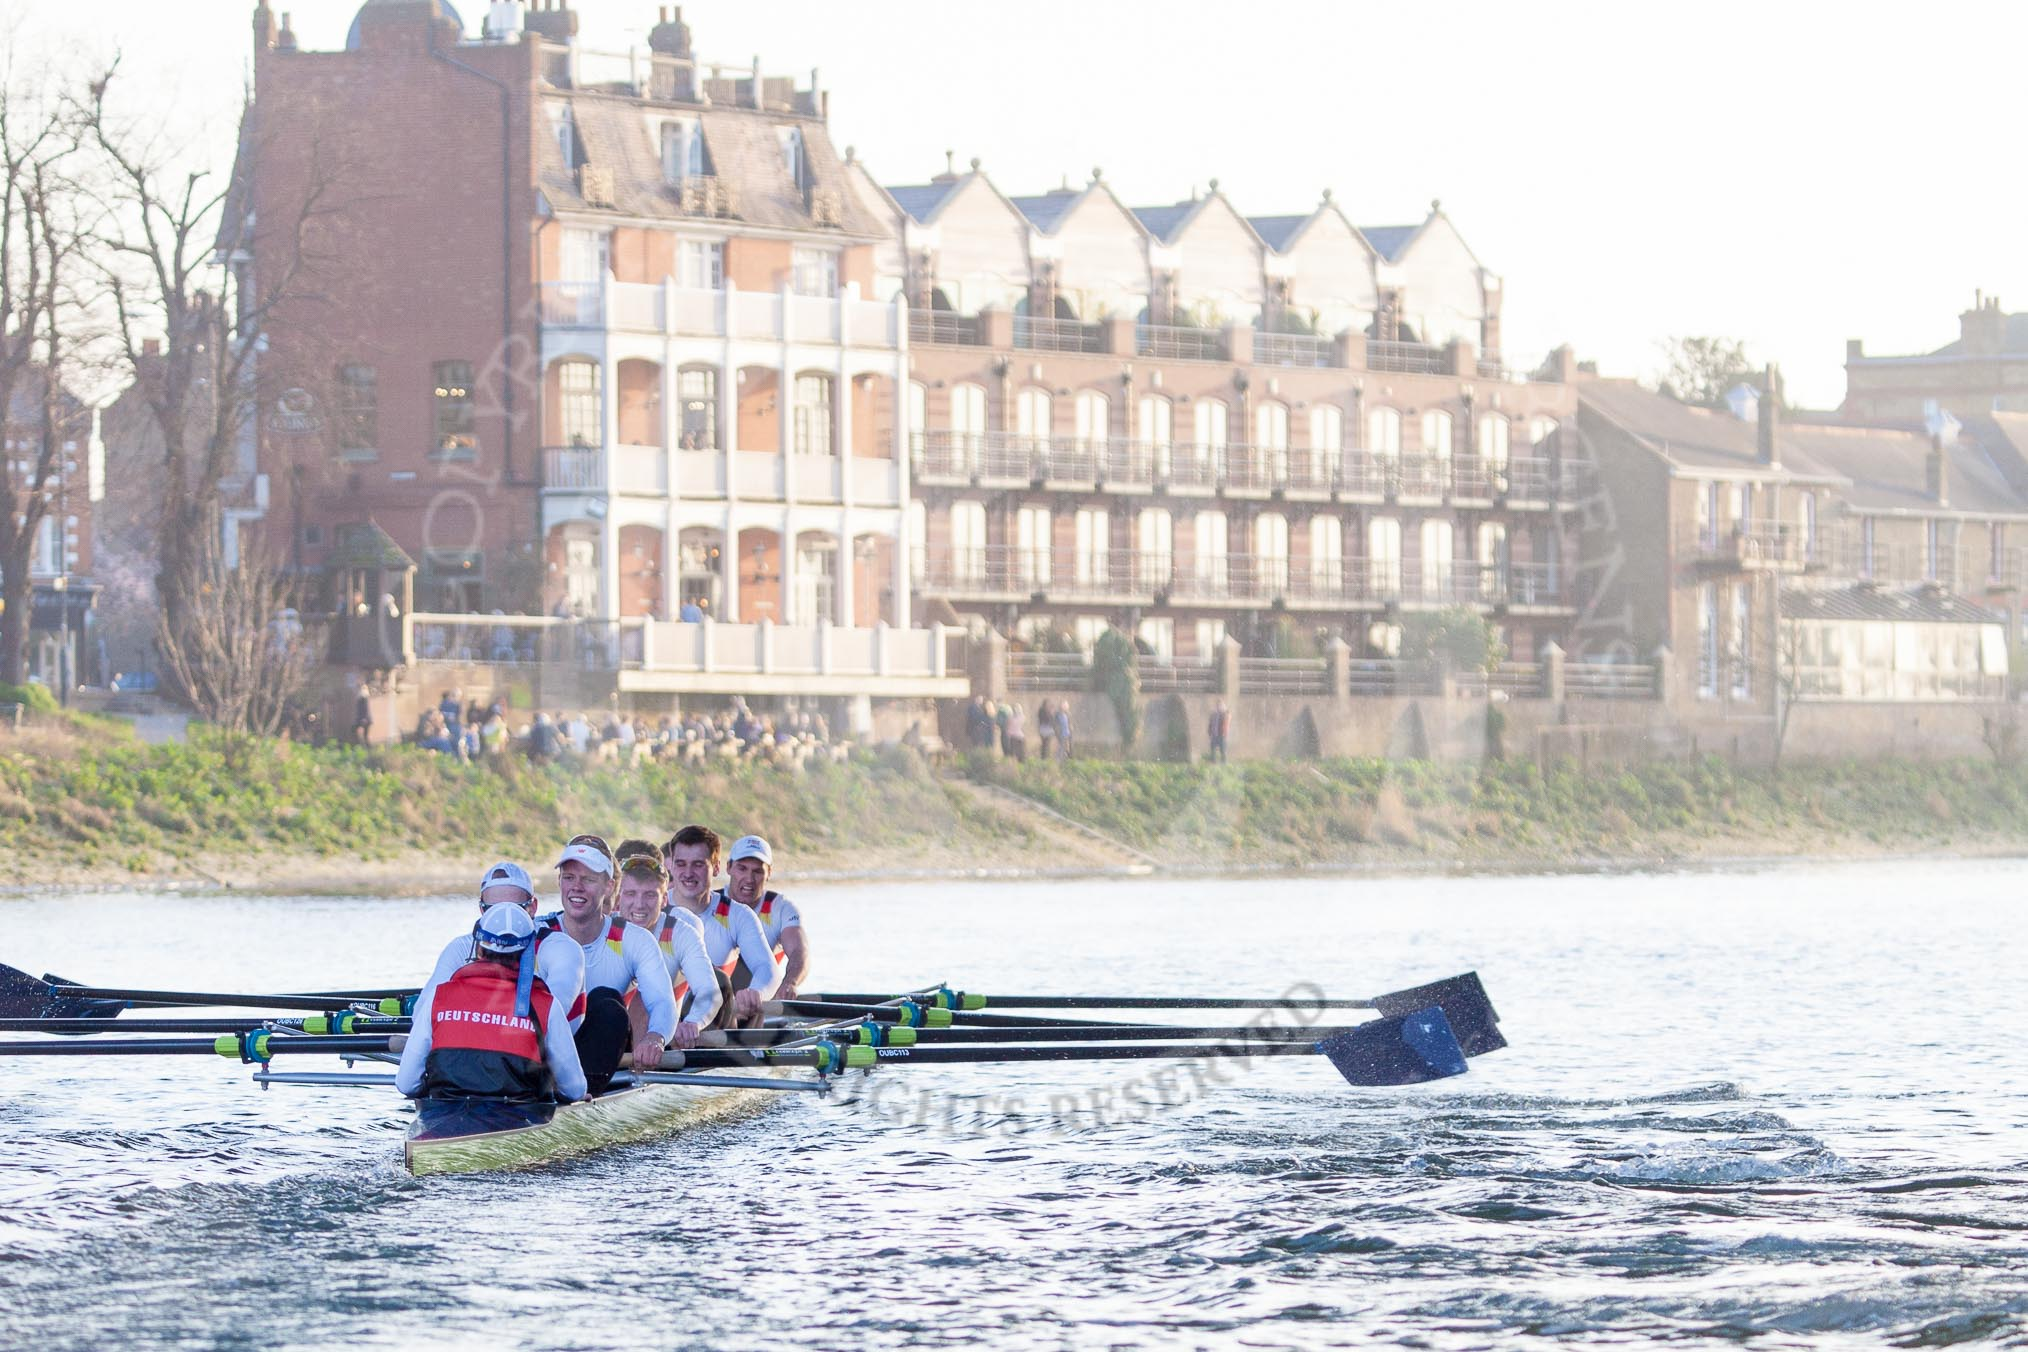 The Boat Race season 2014: OUBC vs. German U23 Photos ...